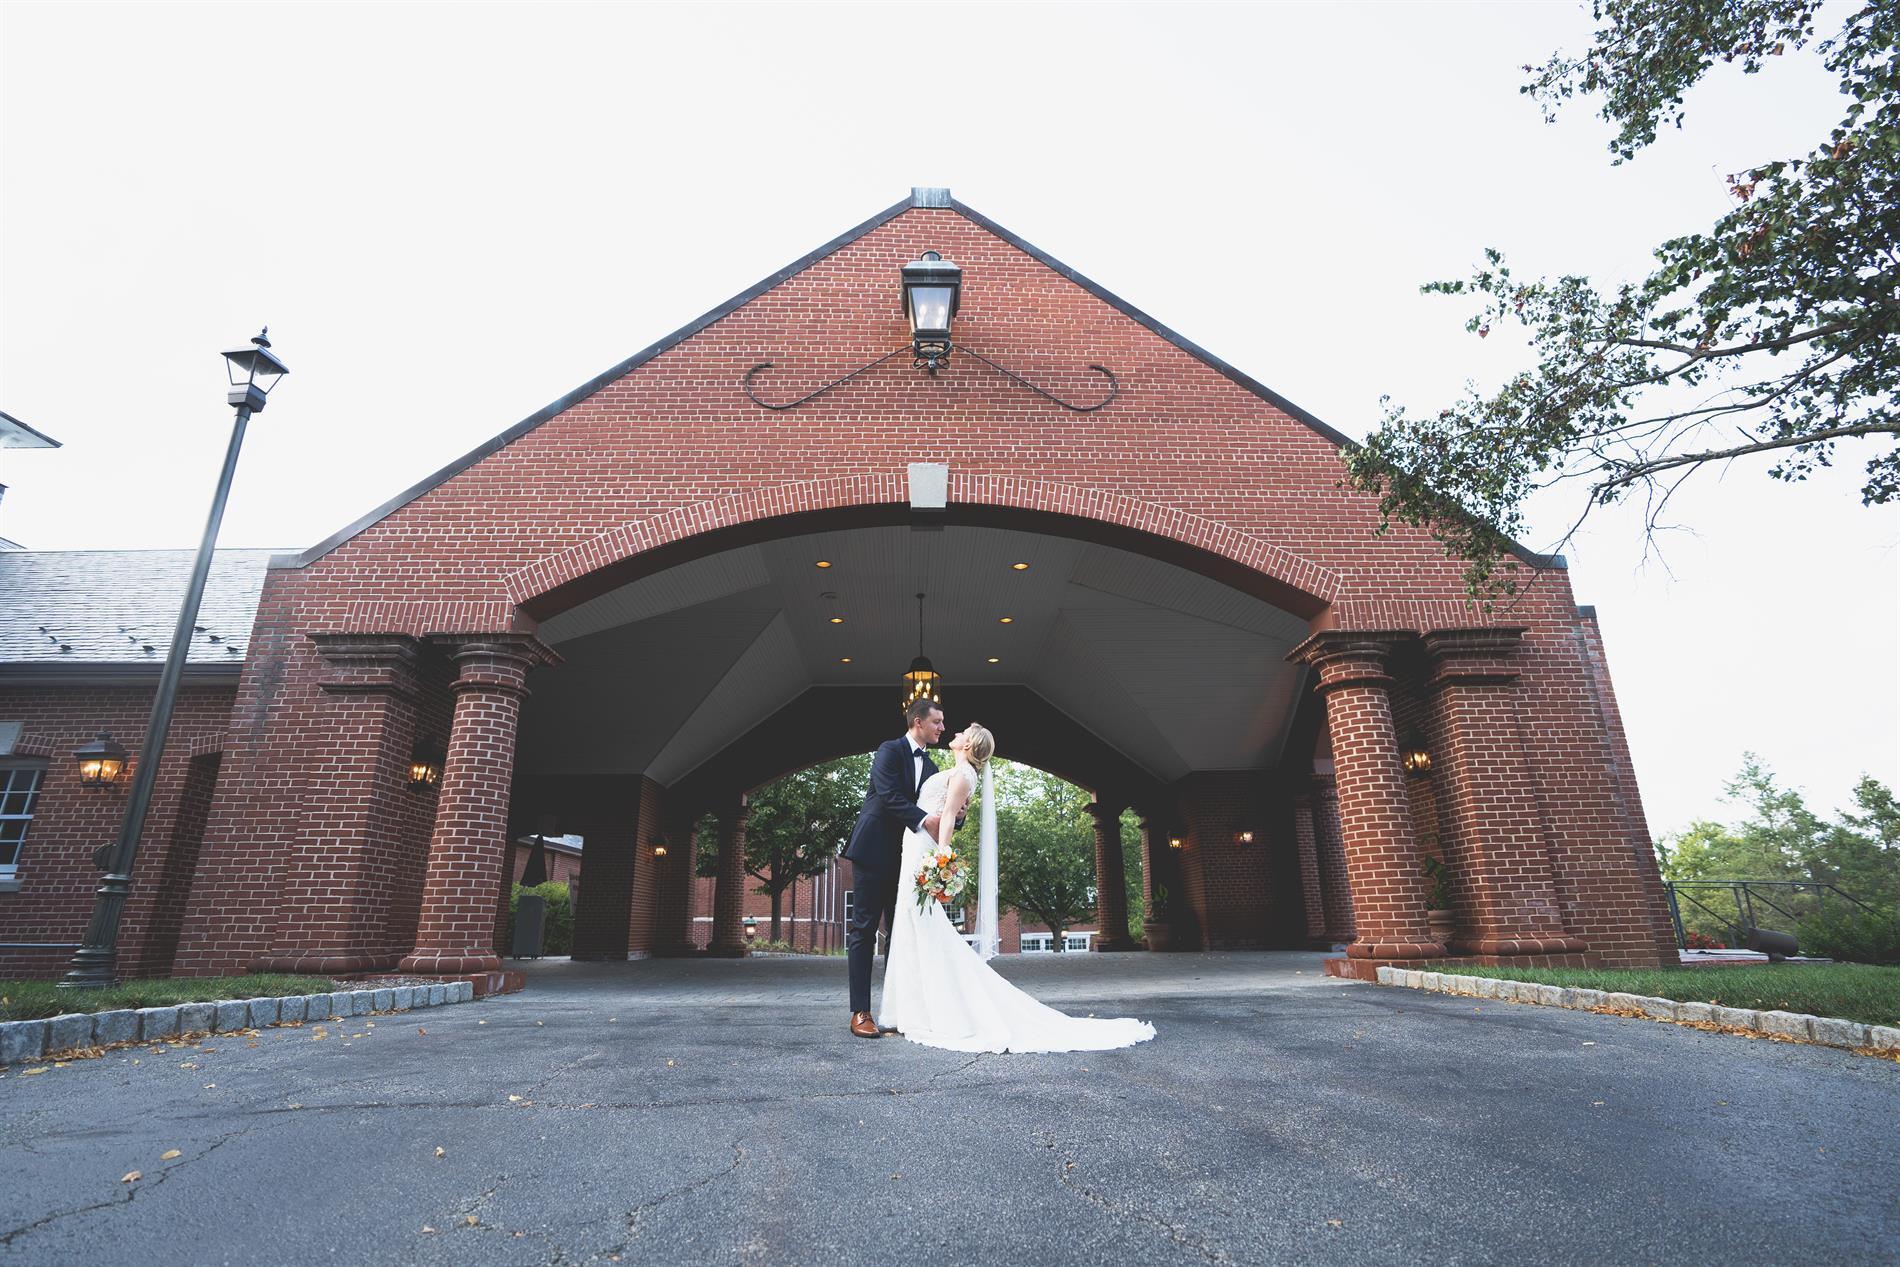 Colleen & Tony Wedding Photos